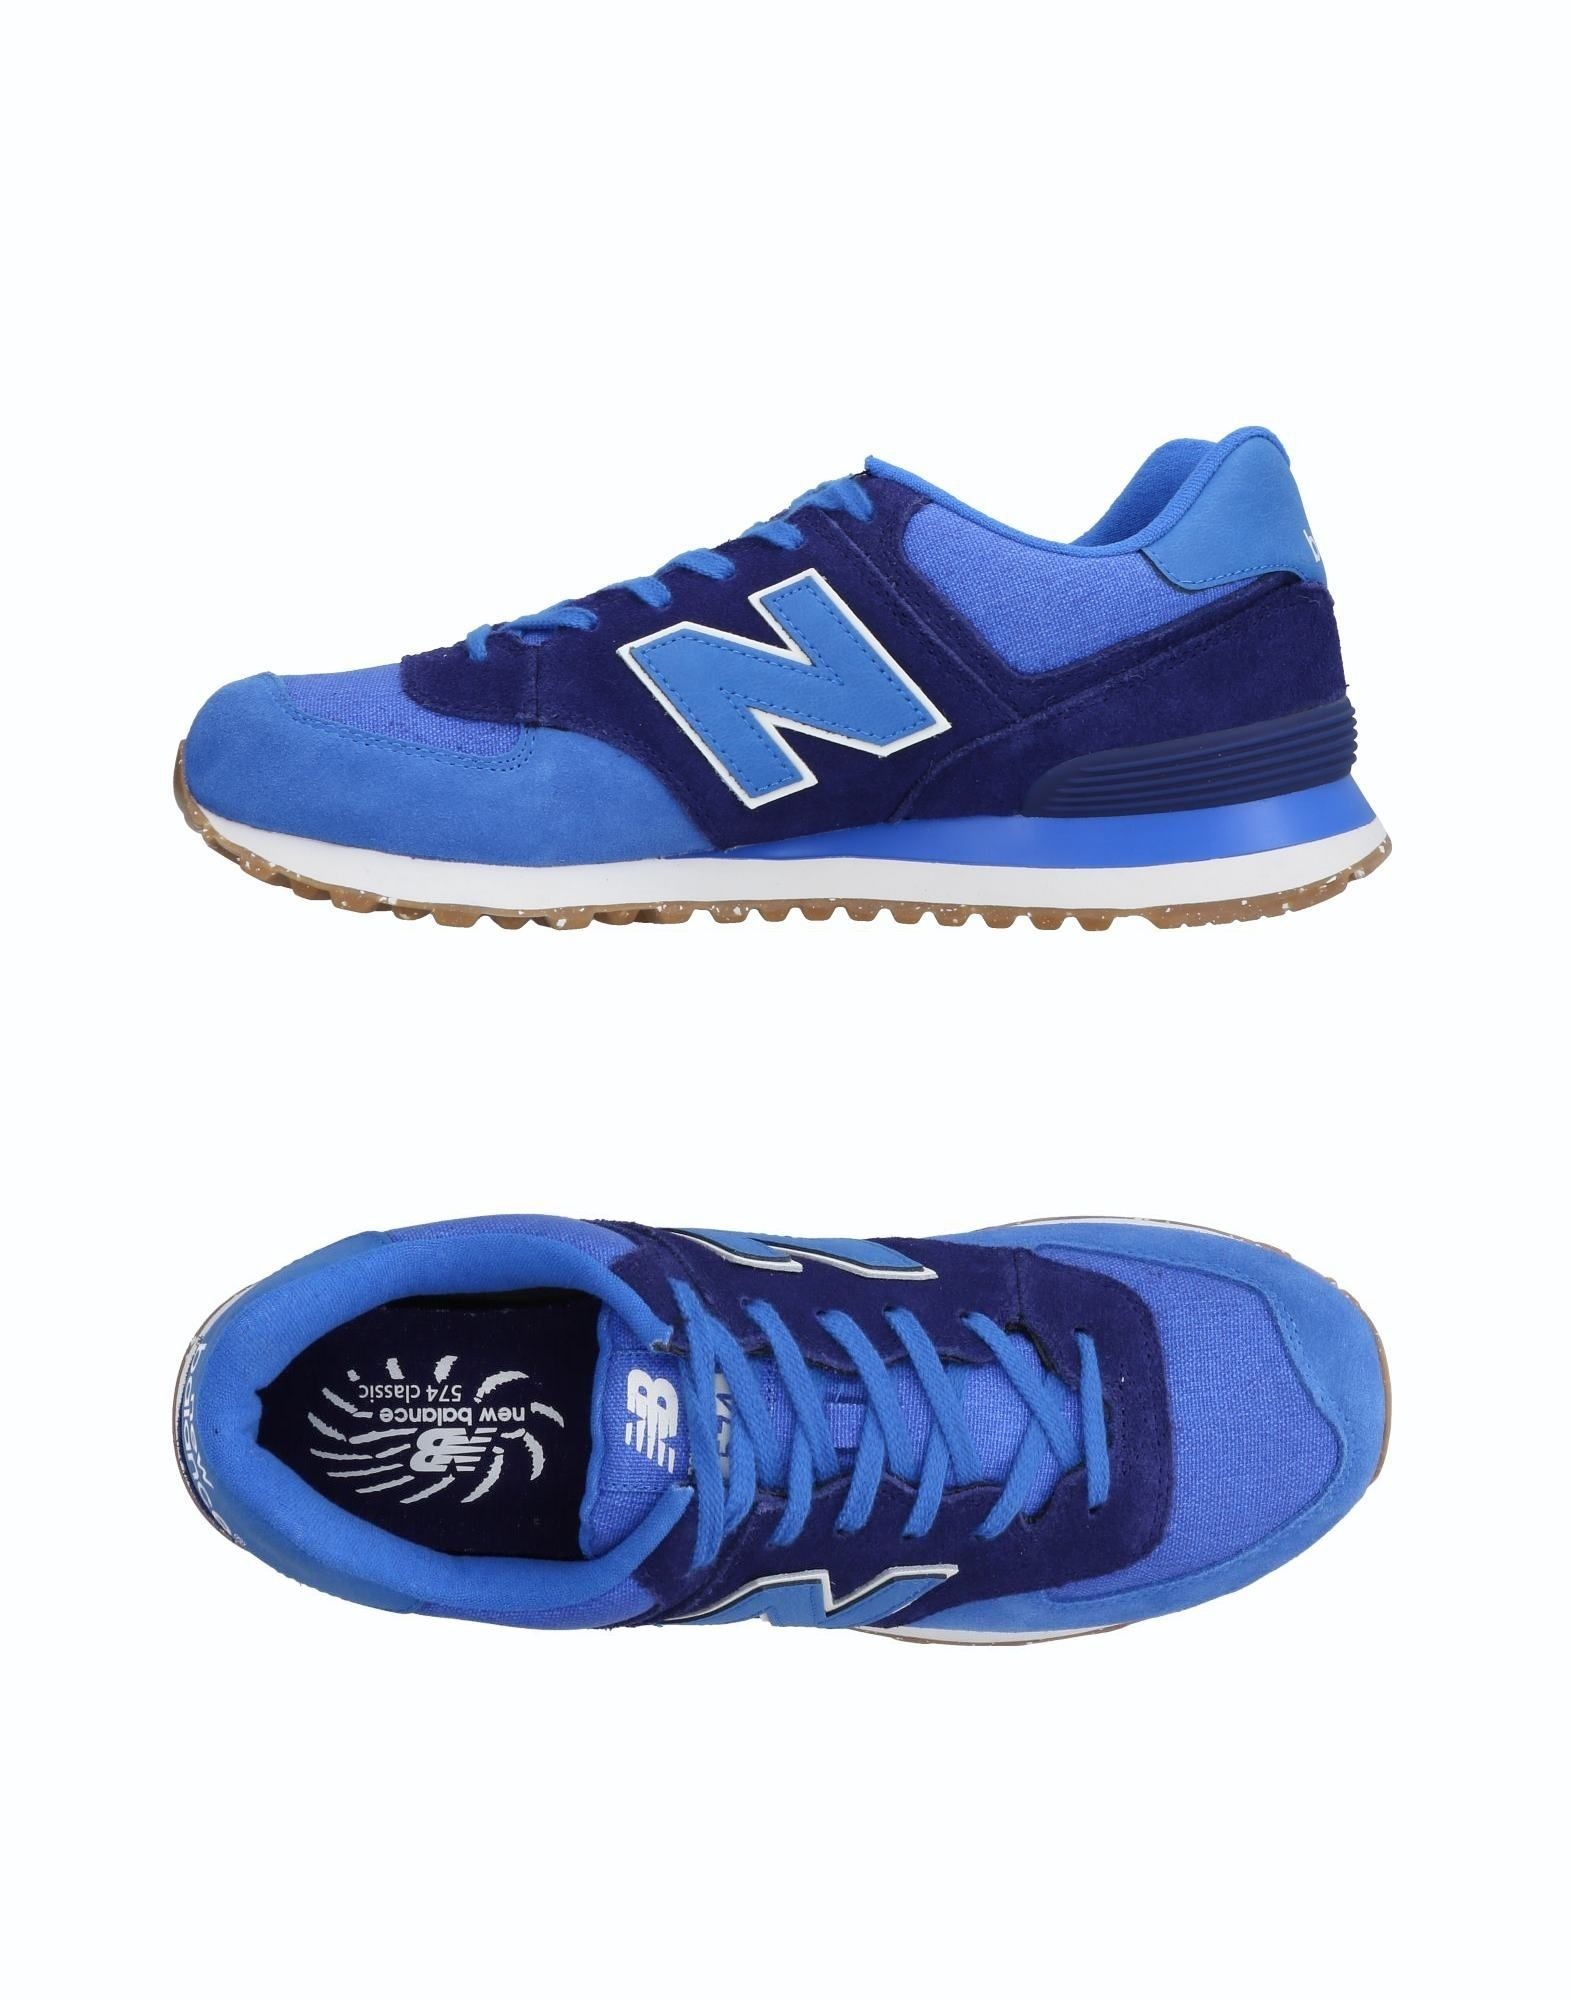 New Balance Sneakers Herren  11513677DI